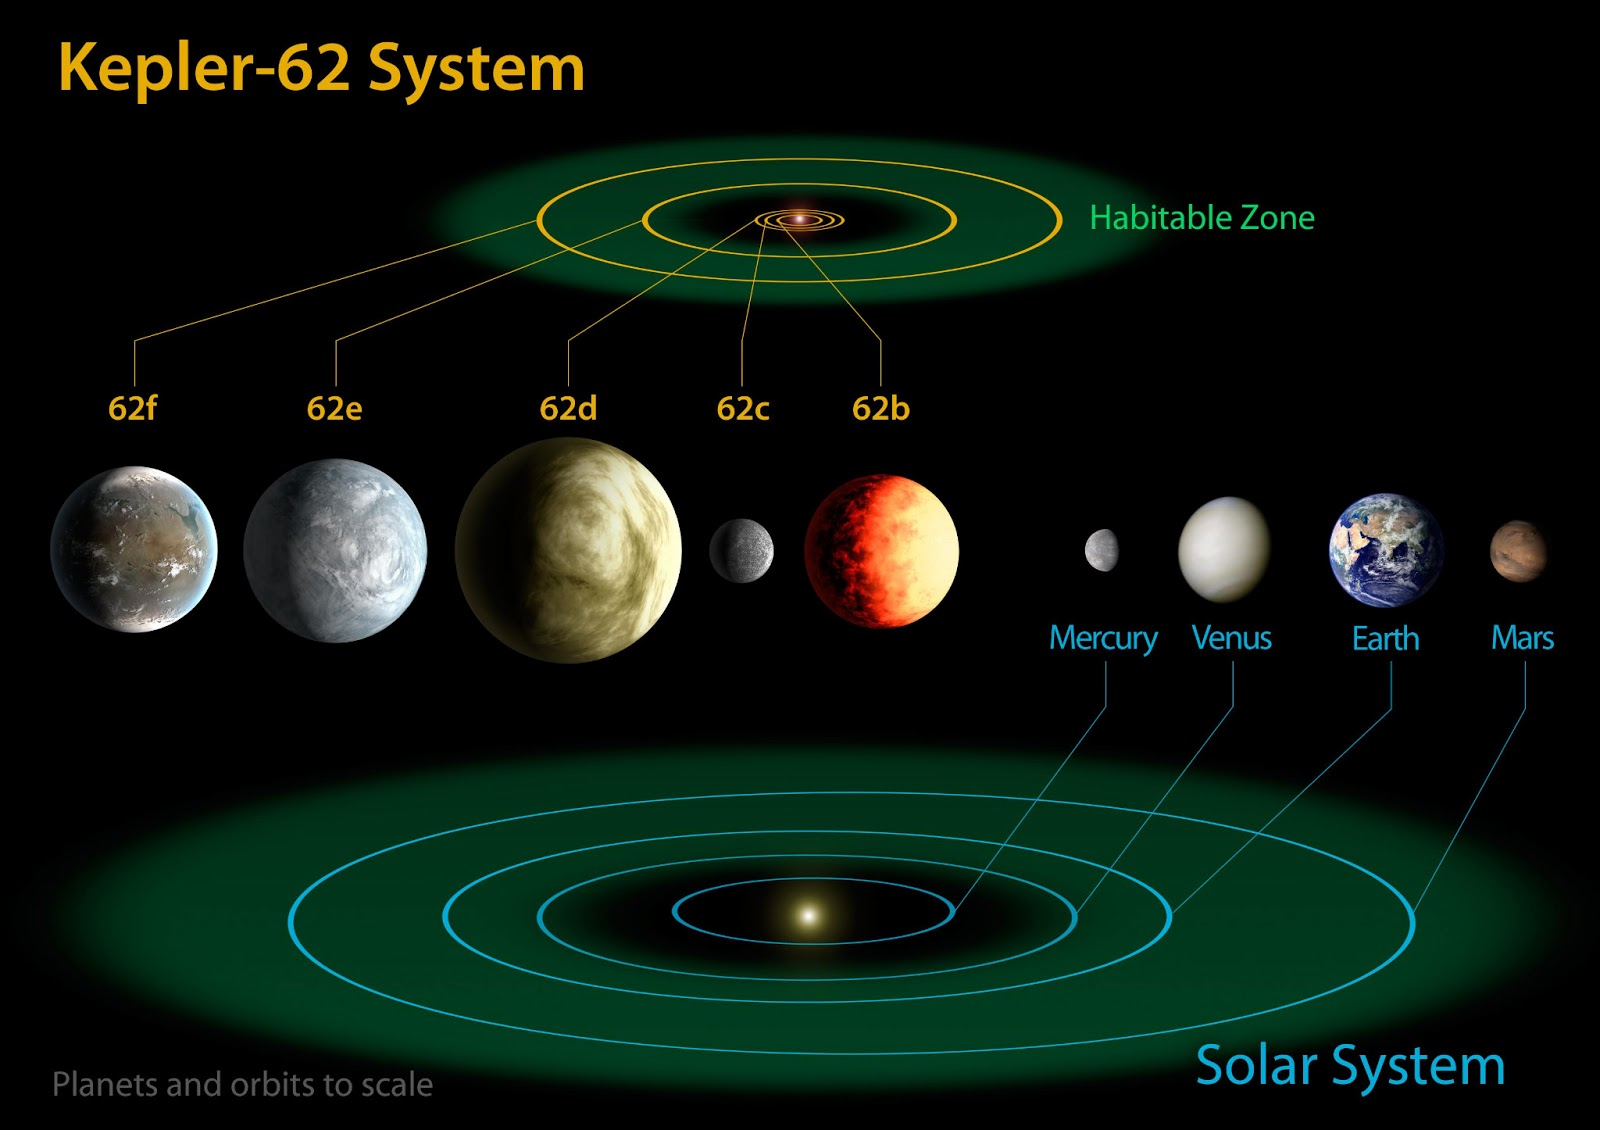 Kepler-62 System & the Solar System